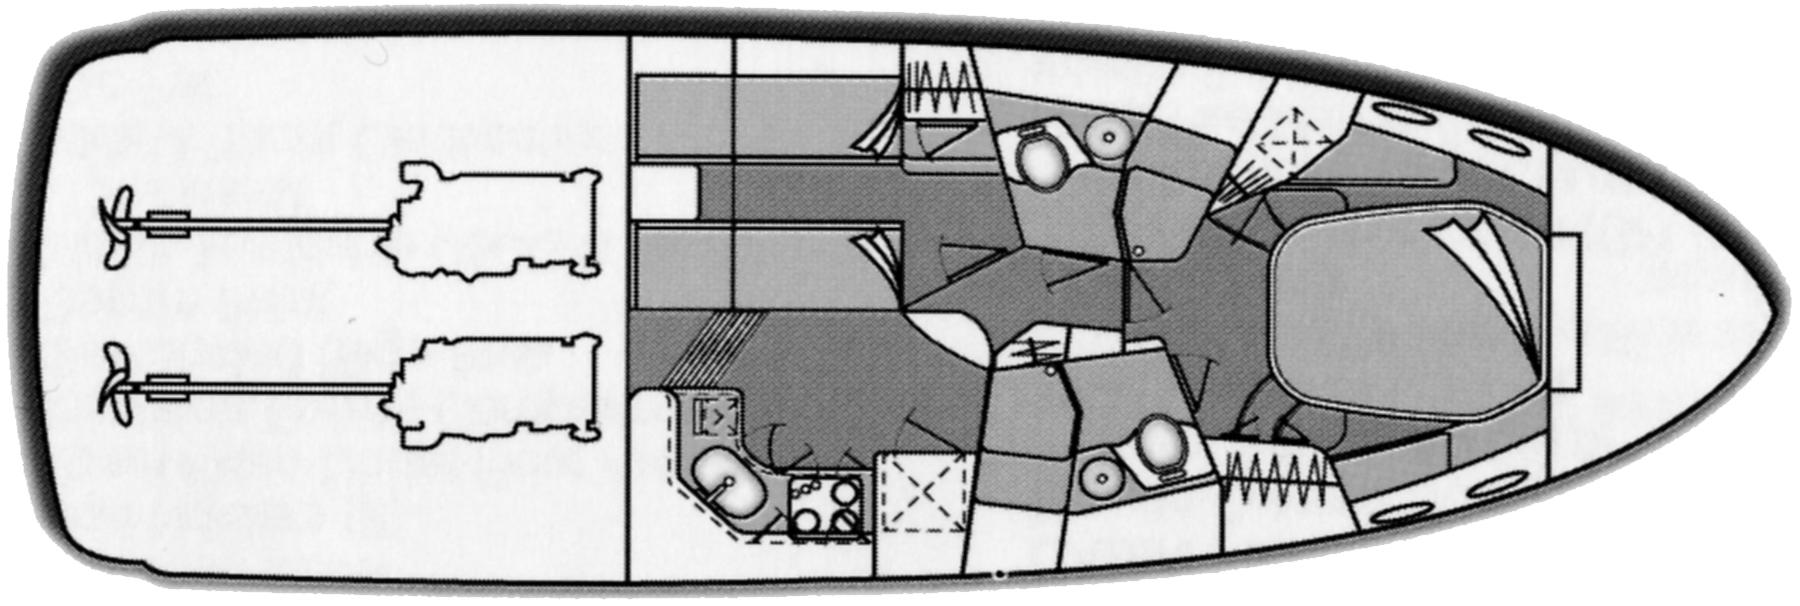 400 Sedan Bridge Floor Plan 2